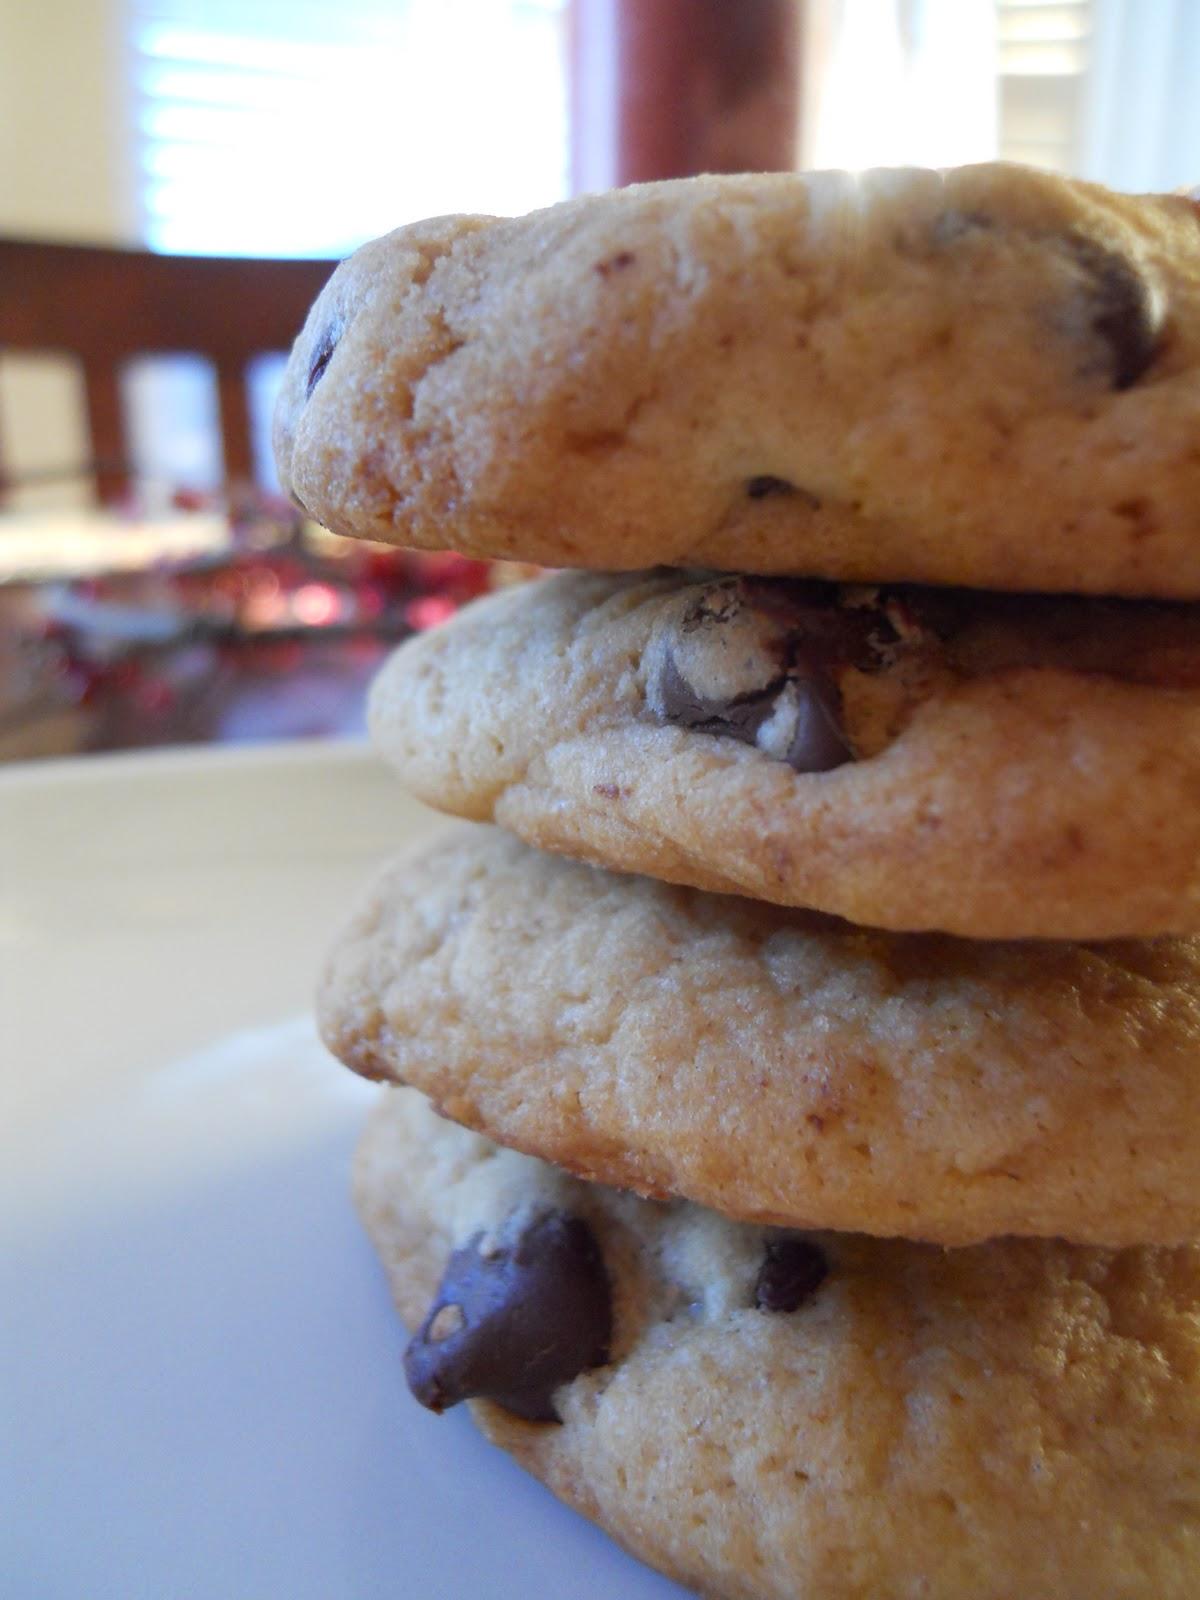 See Aimee Cook: My new favorite chocolate chip cookies